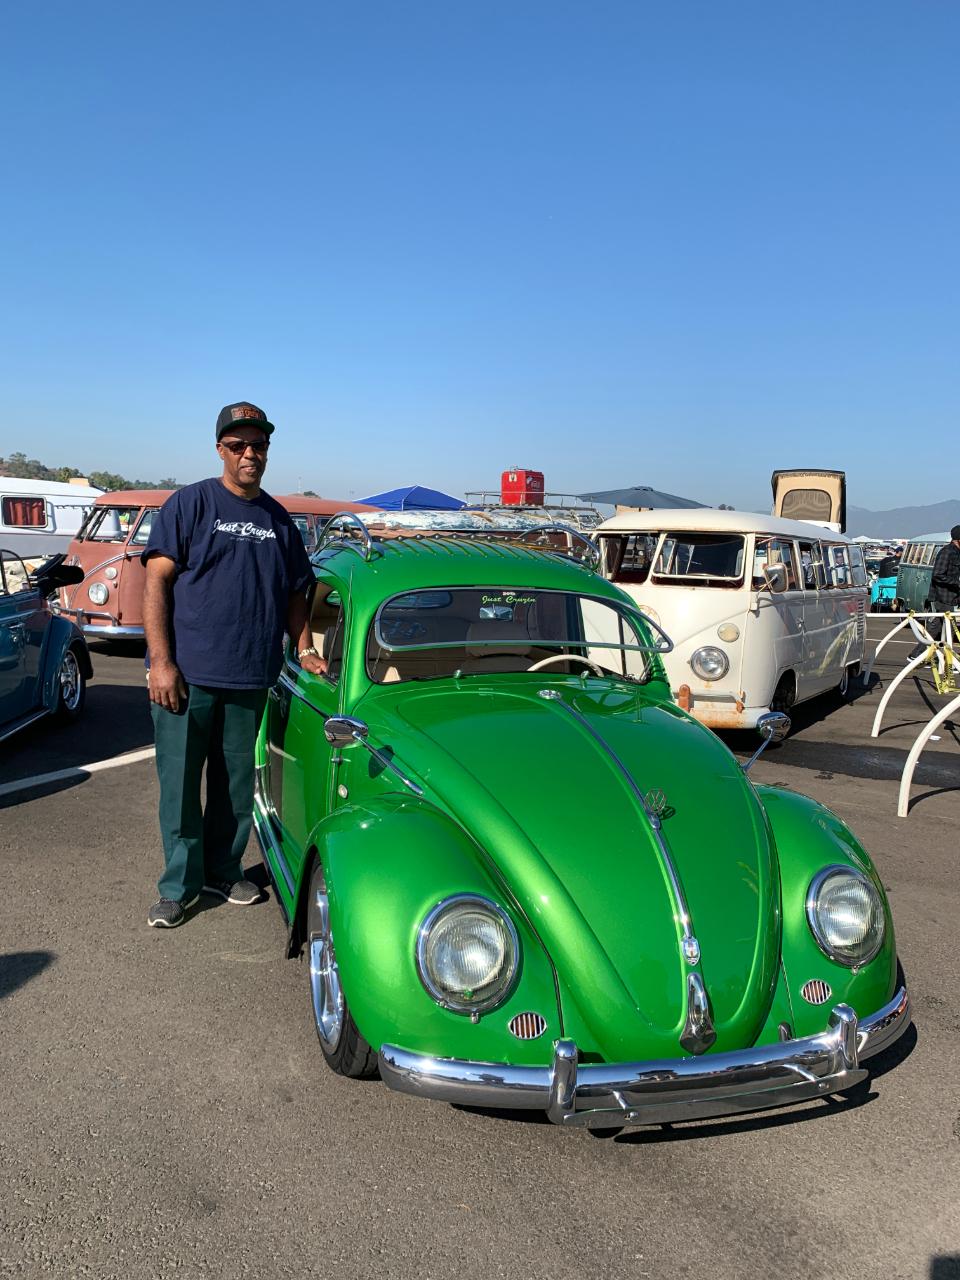 Wayne Holloway with his 1956 VW Beetle